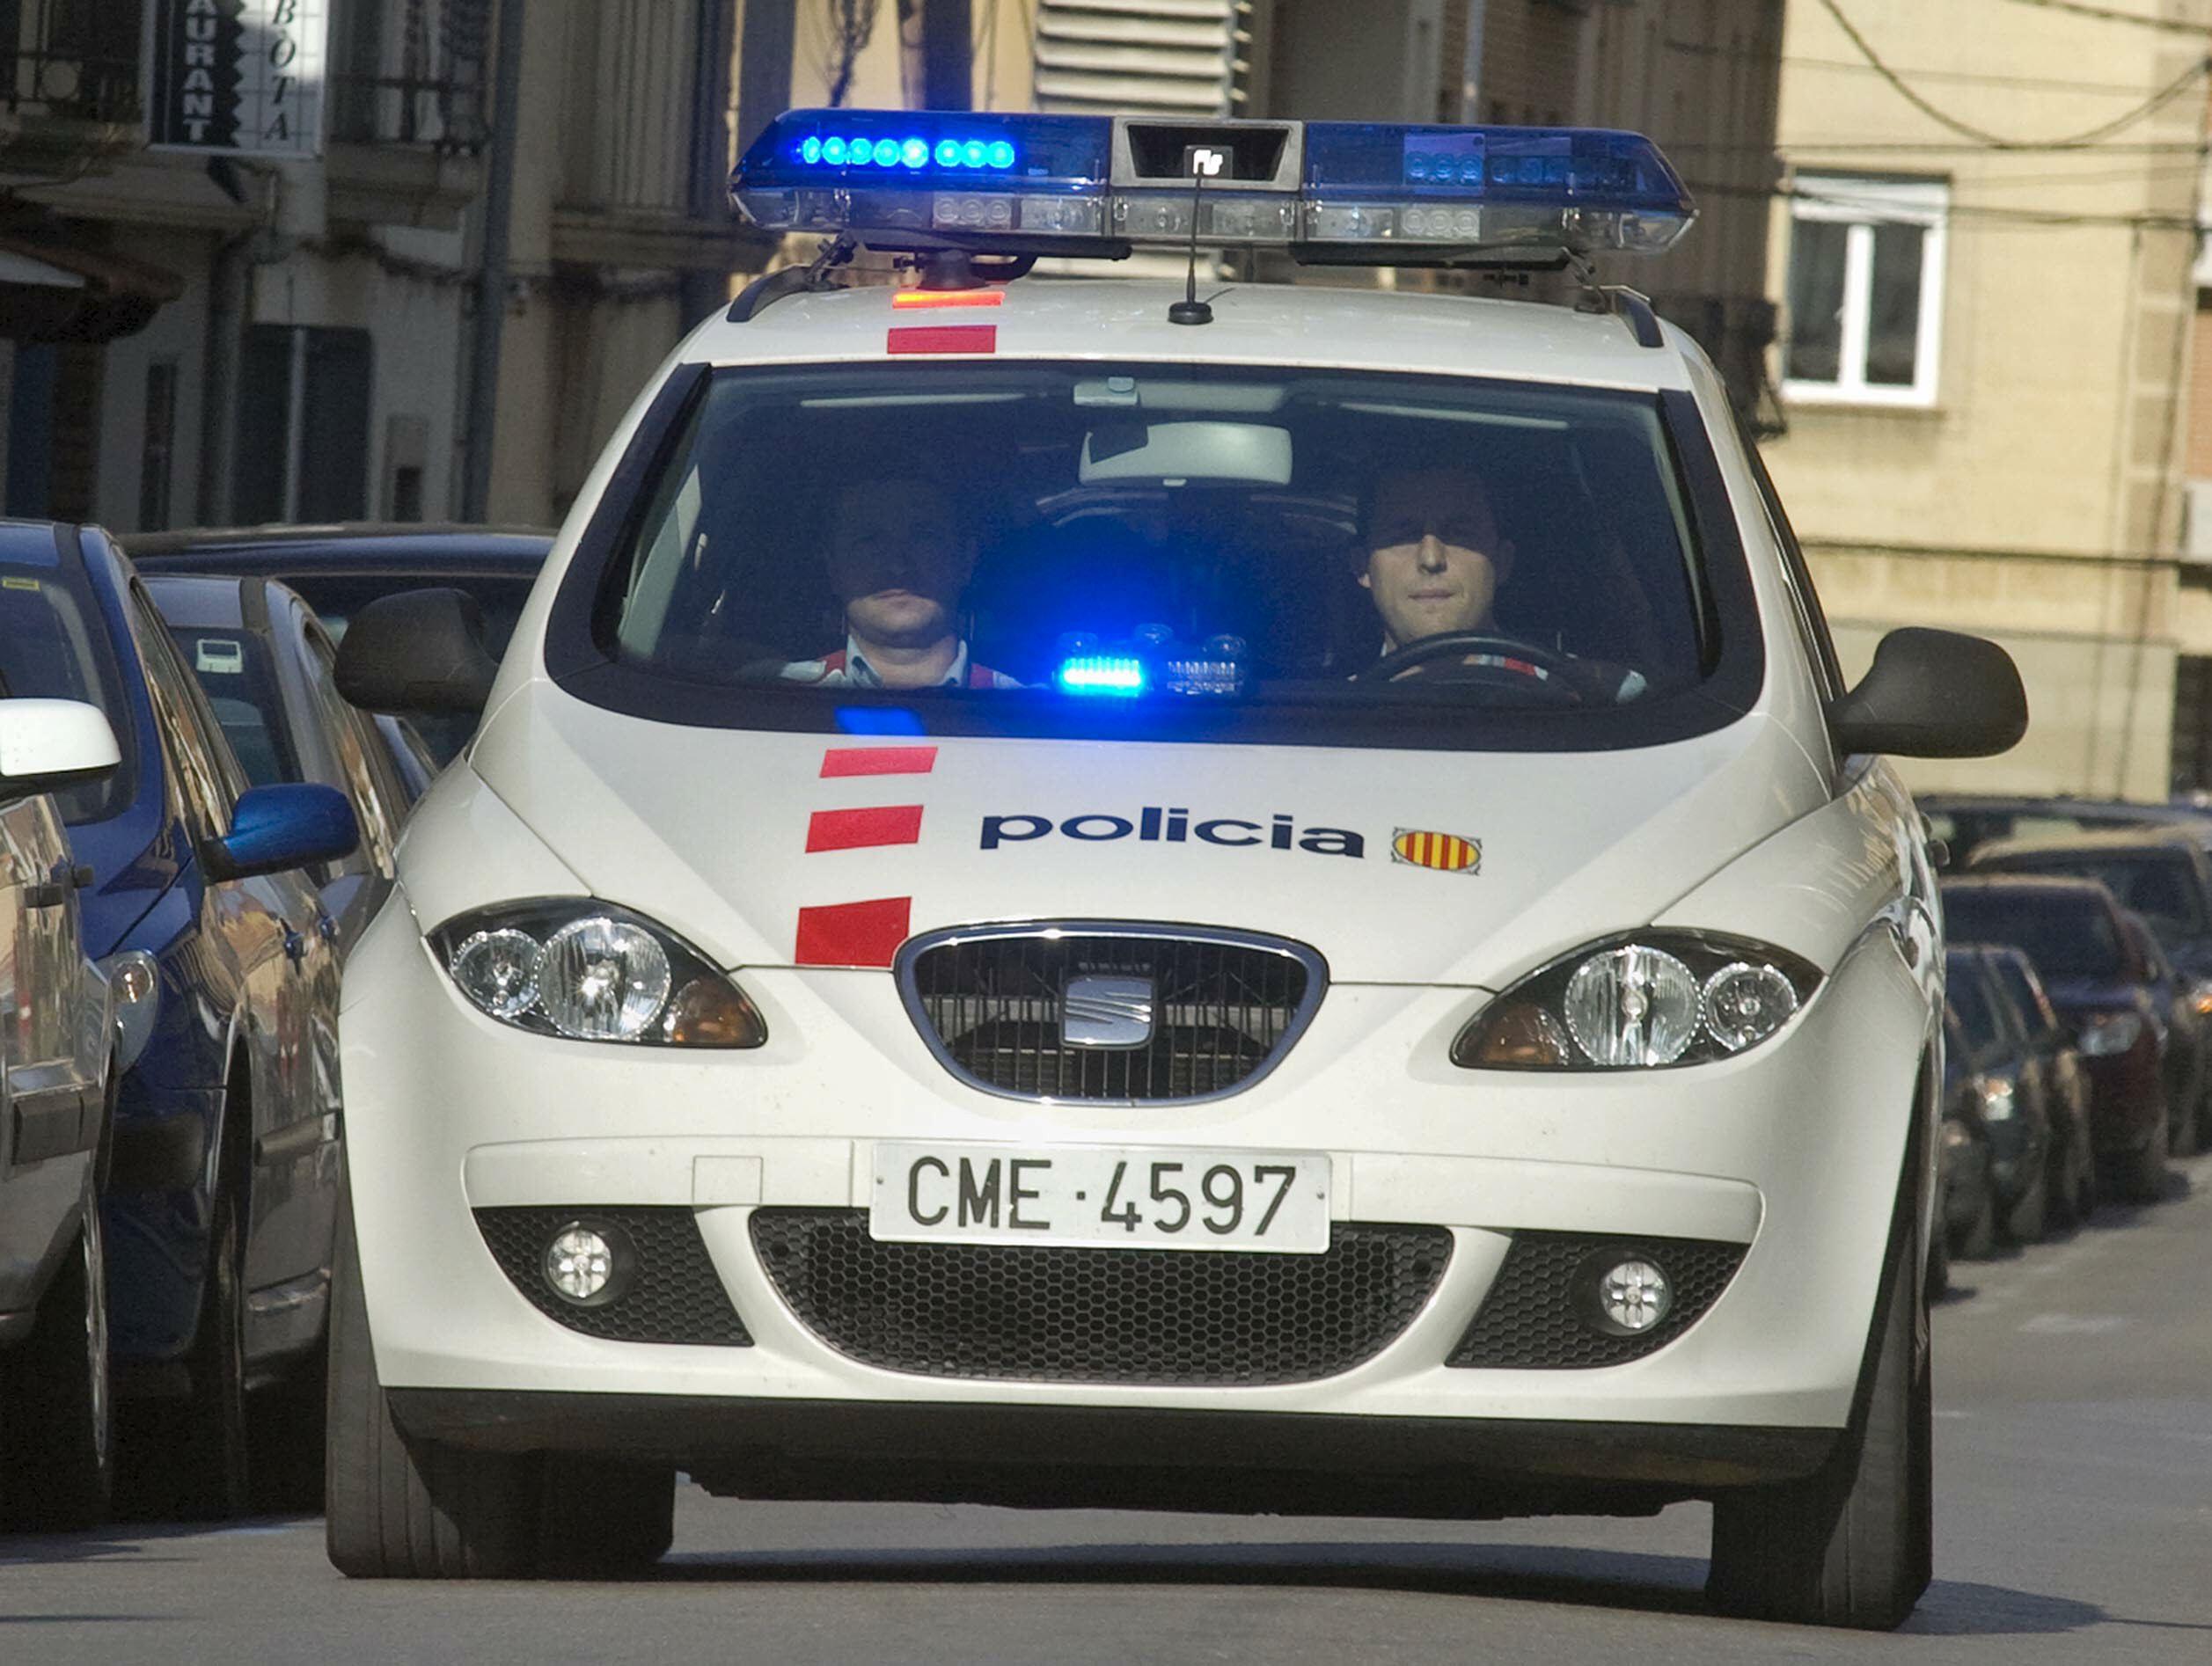 Tres detenidos por matar a un menor al que arrojaron desde un tercer piso